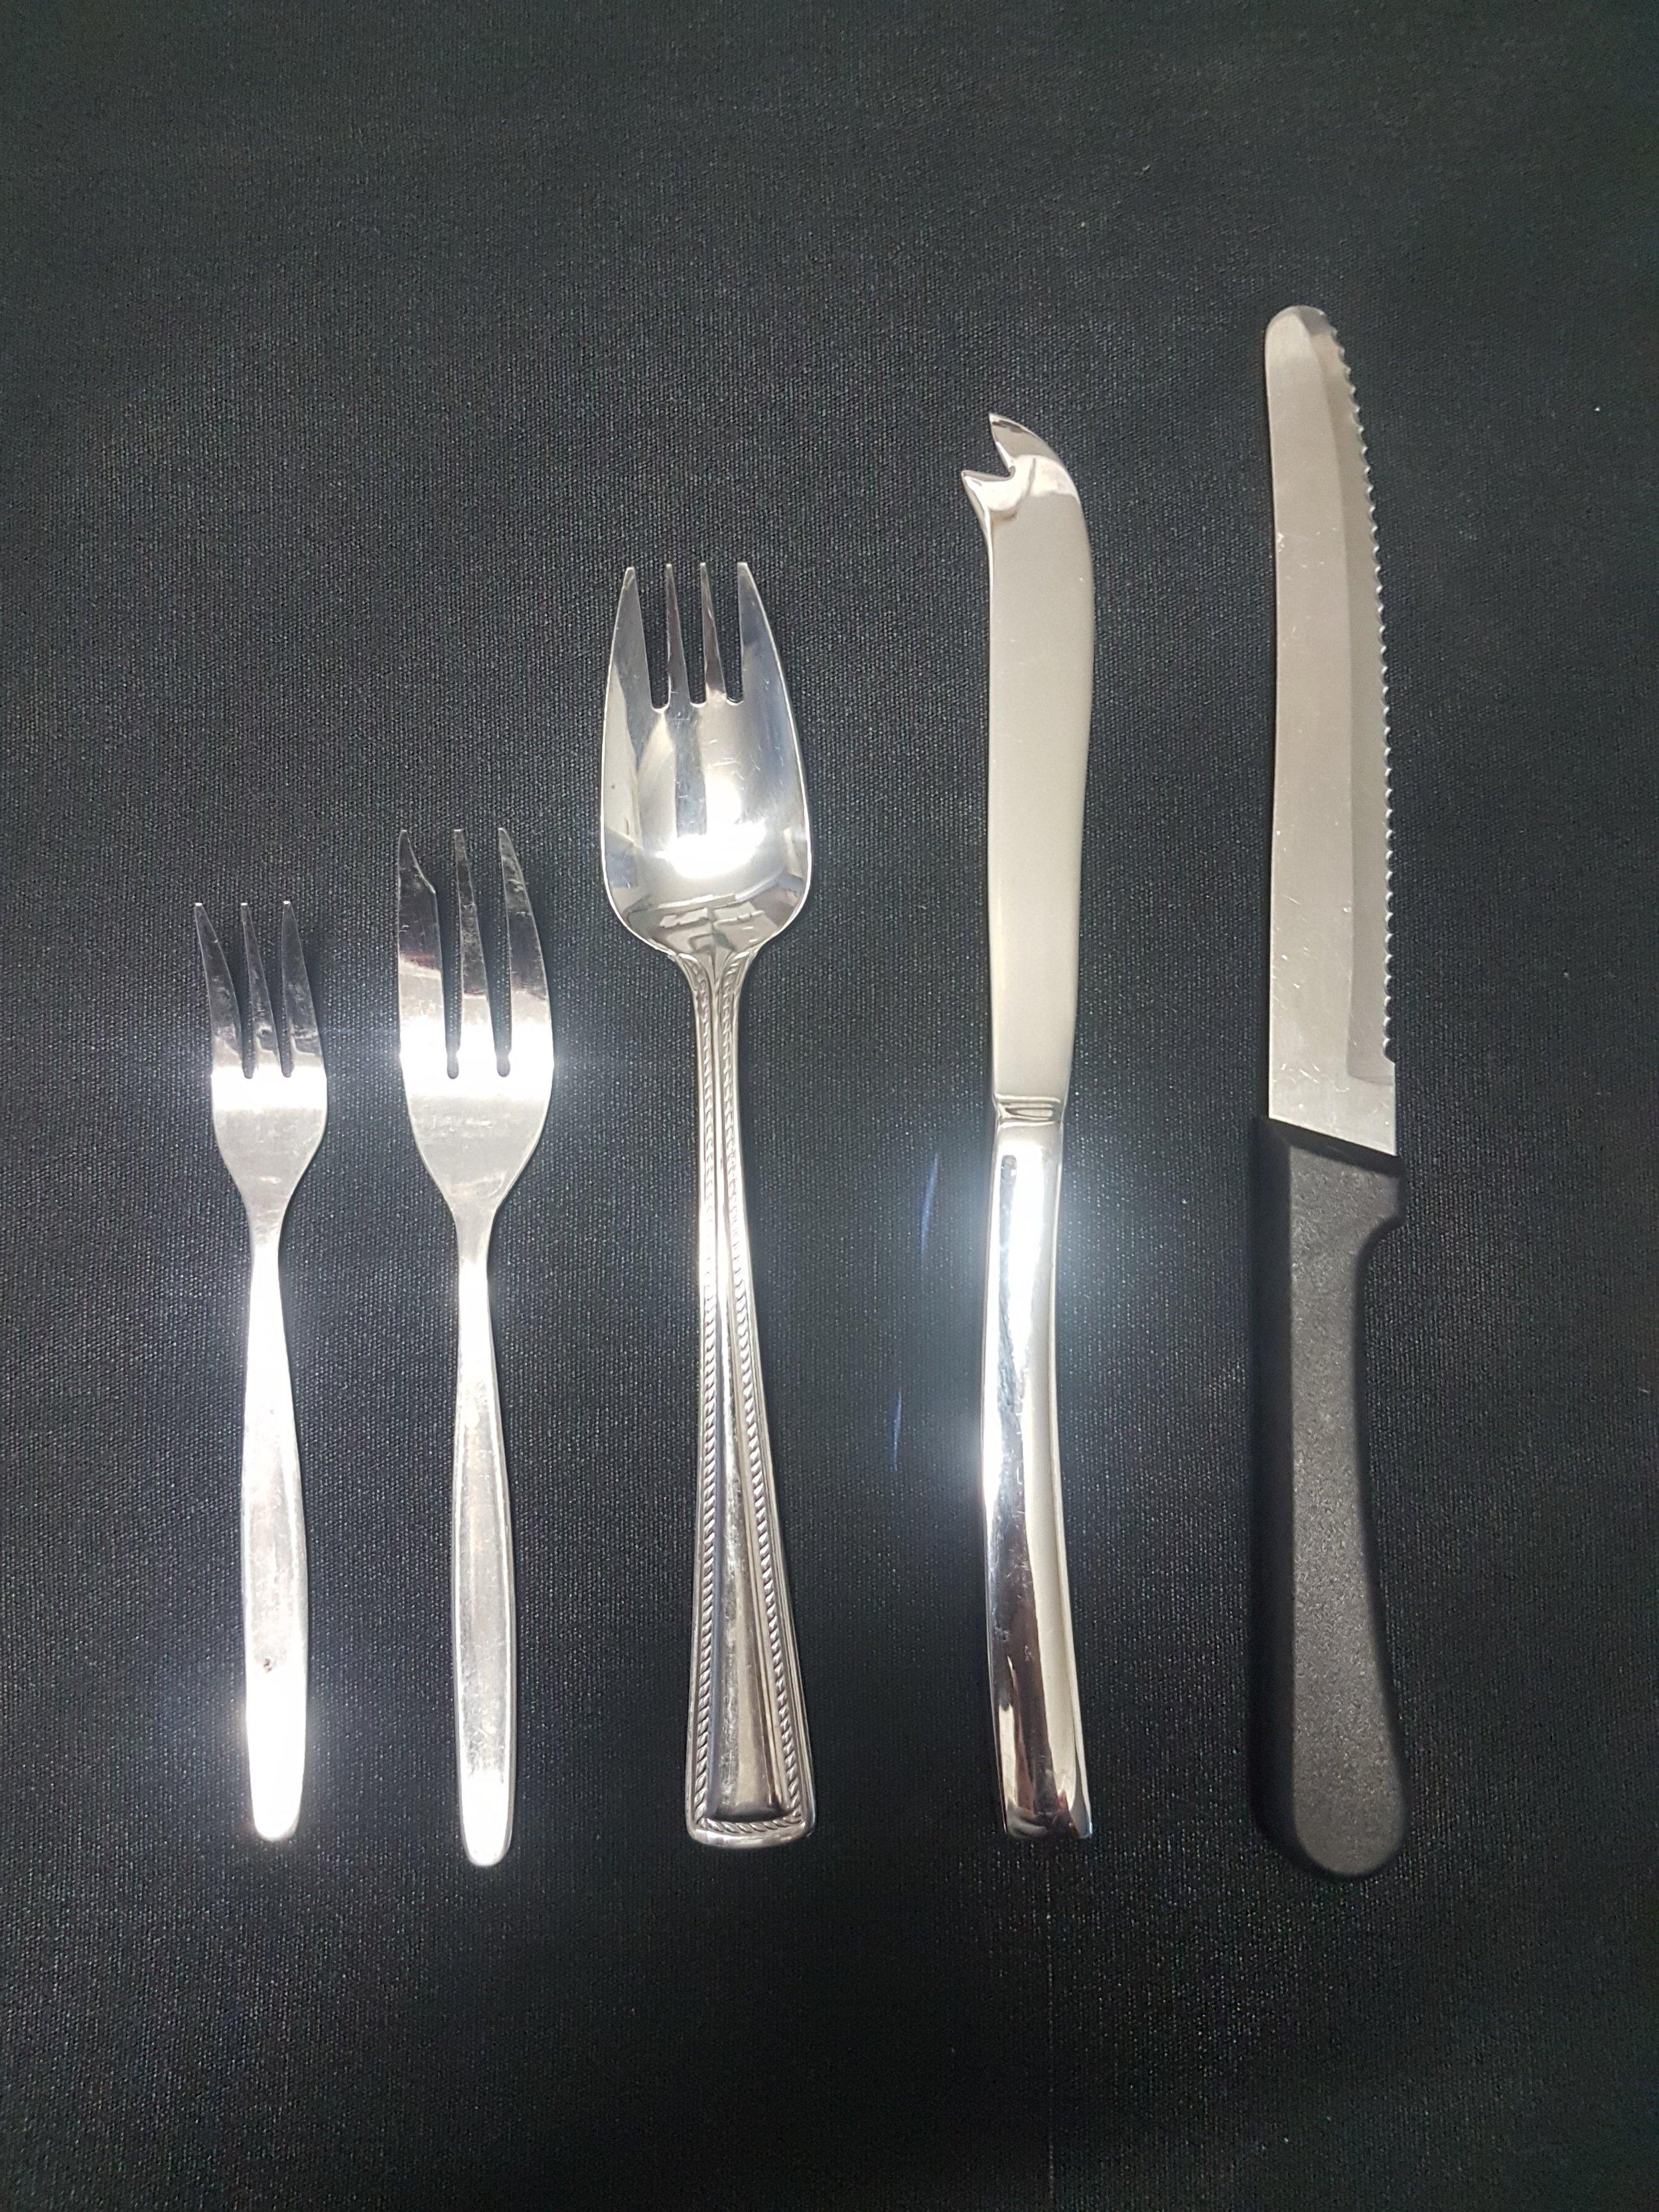 - Oyster Fork .44c eaSmall Cake Fork .39c eaLarge Cake Fork .44c eaCheese Knife .55c eaSteak Knife .44c ea